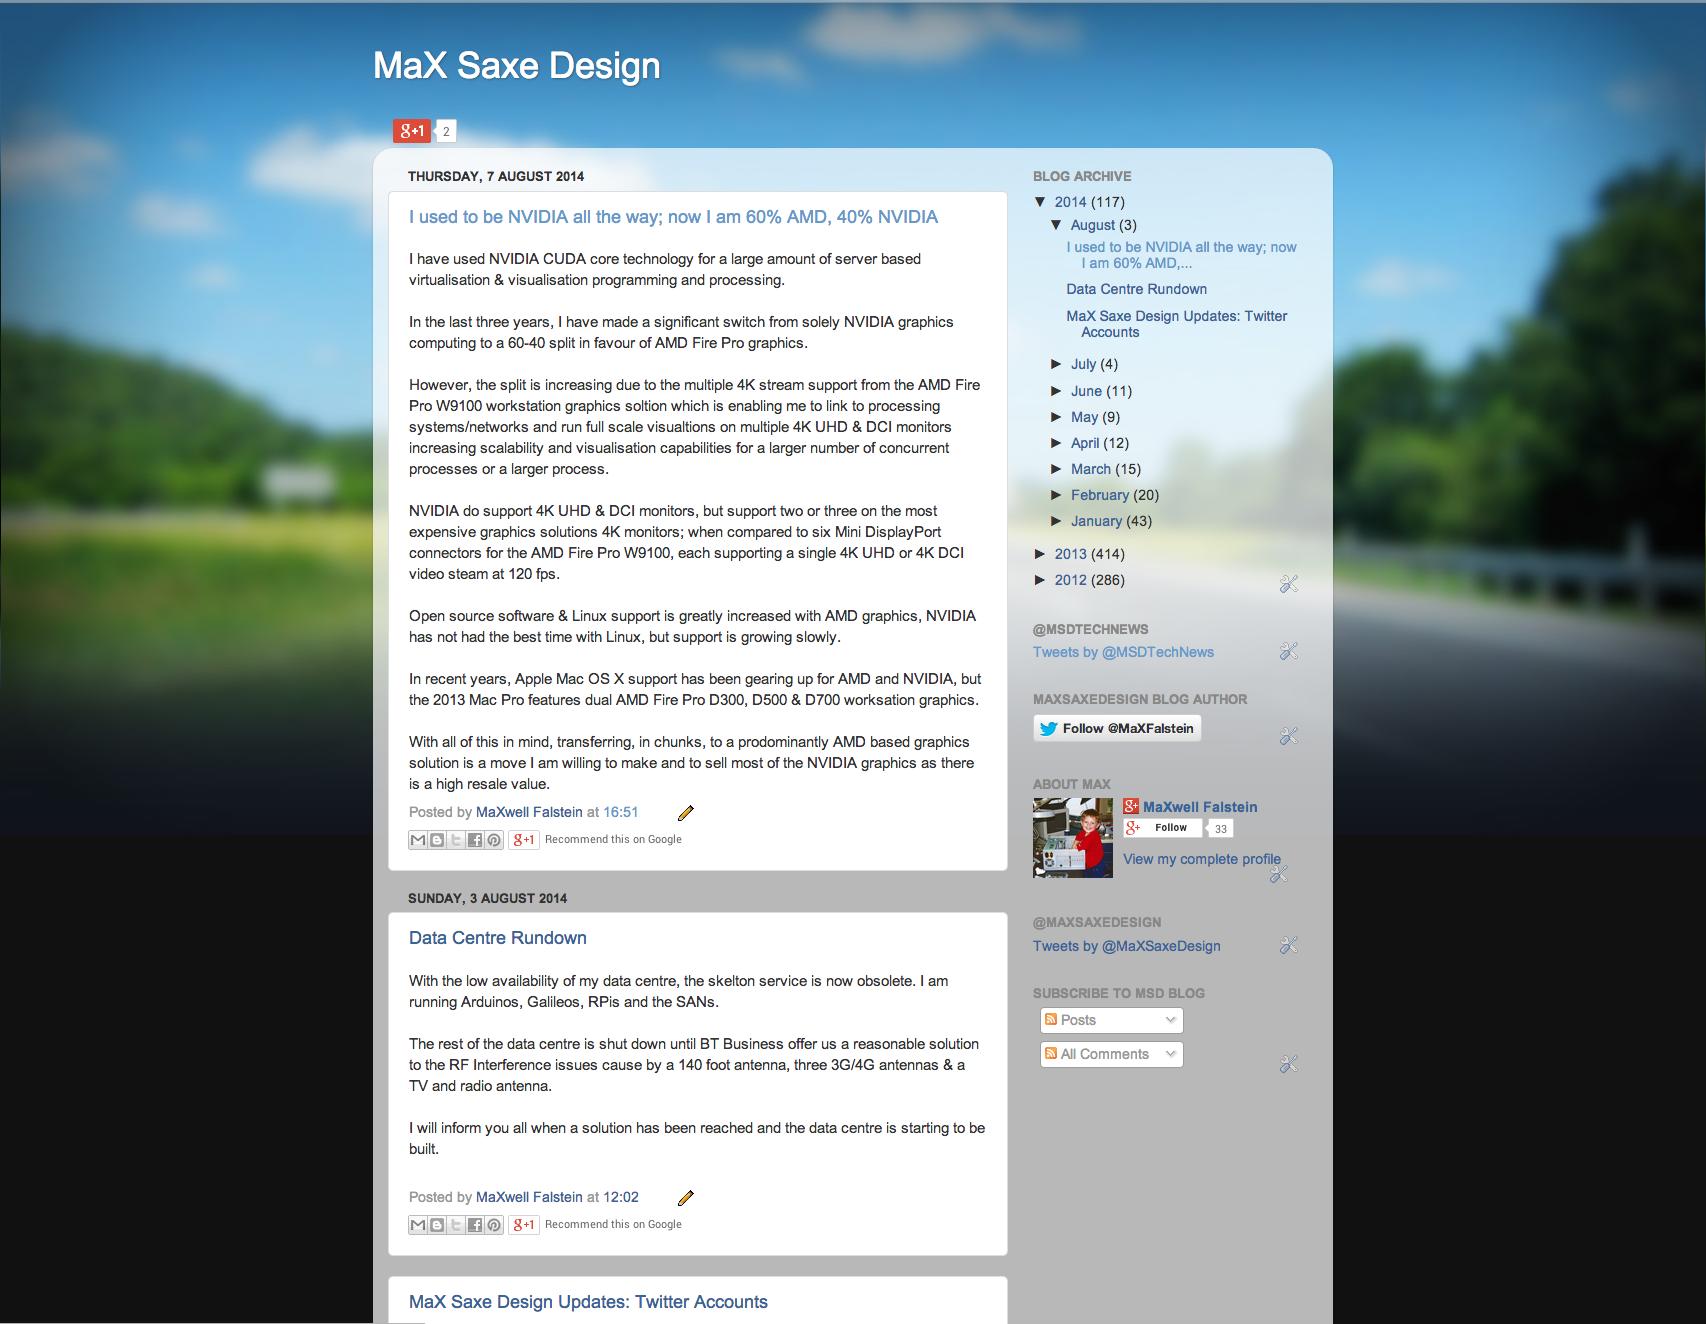 MaX Saxe Design Blogspot Screen Capture